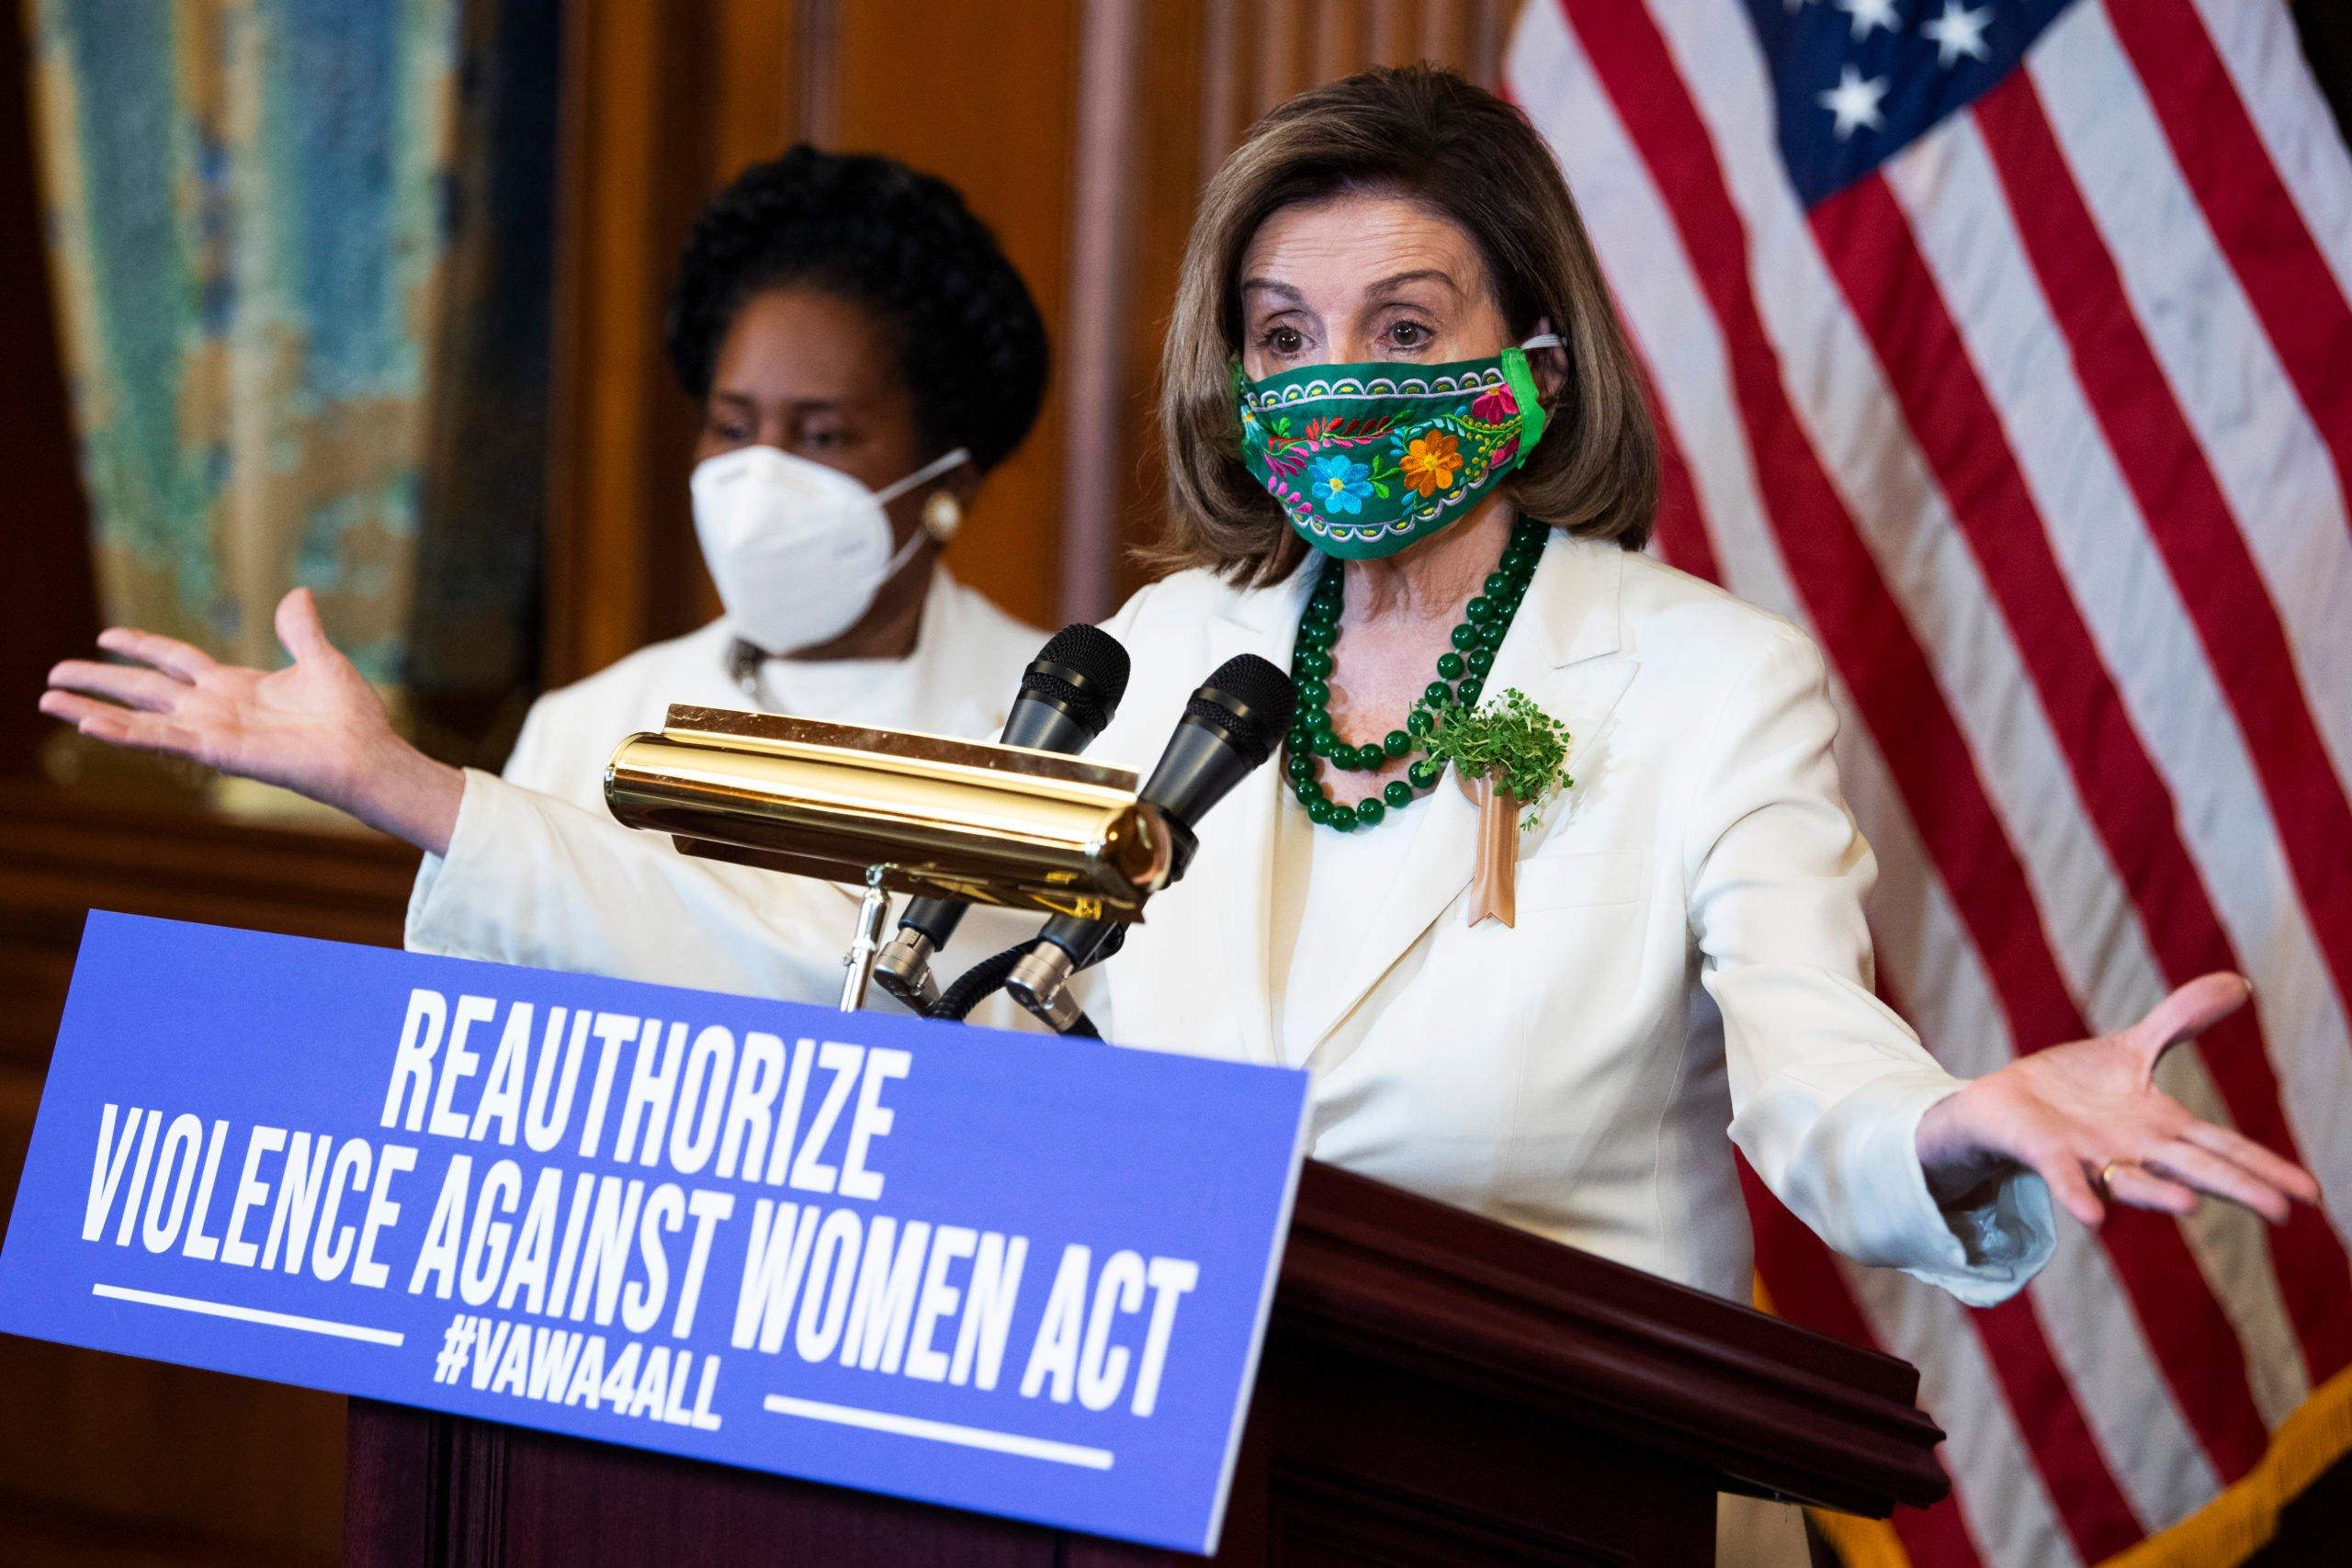 Violence Against Women Act Reauthorization Targets Major Gun Loopholes